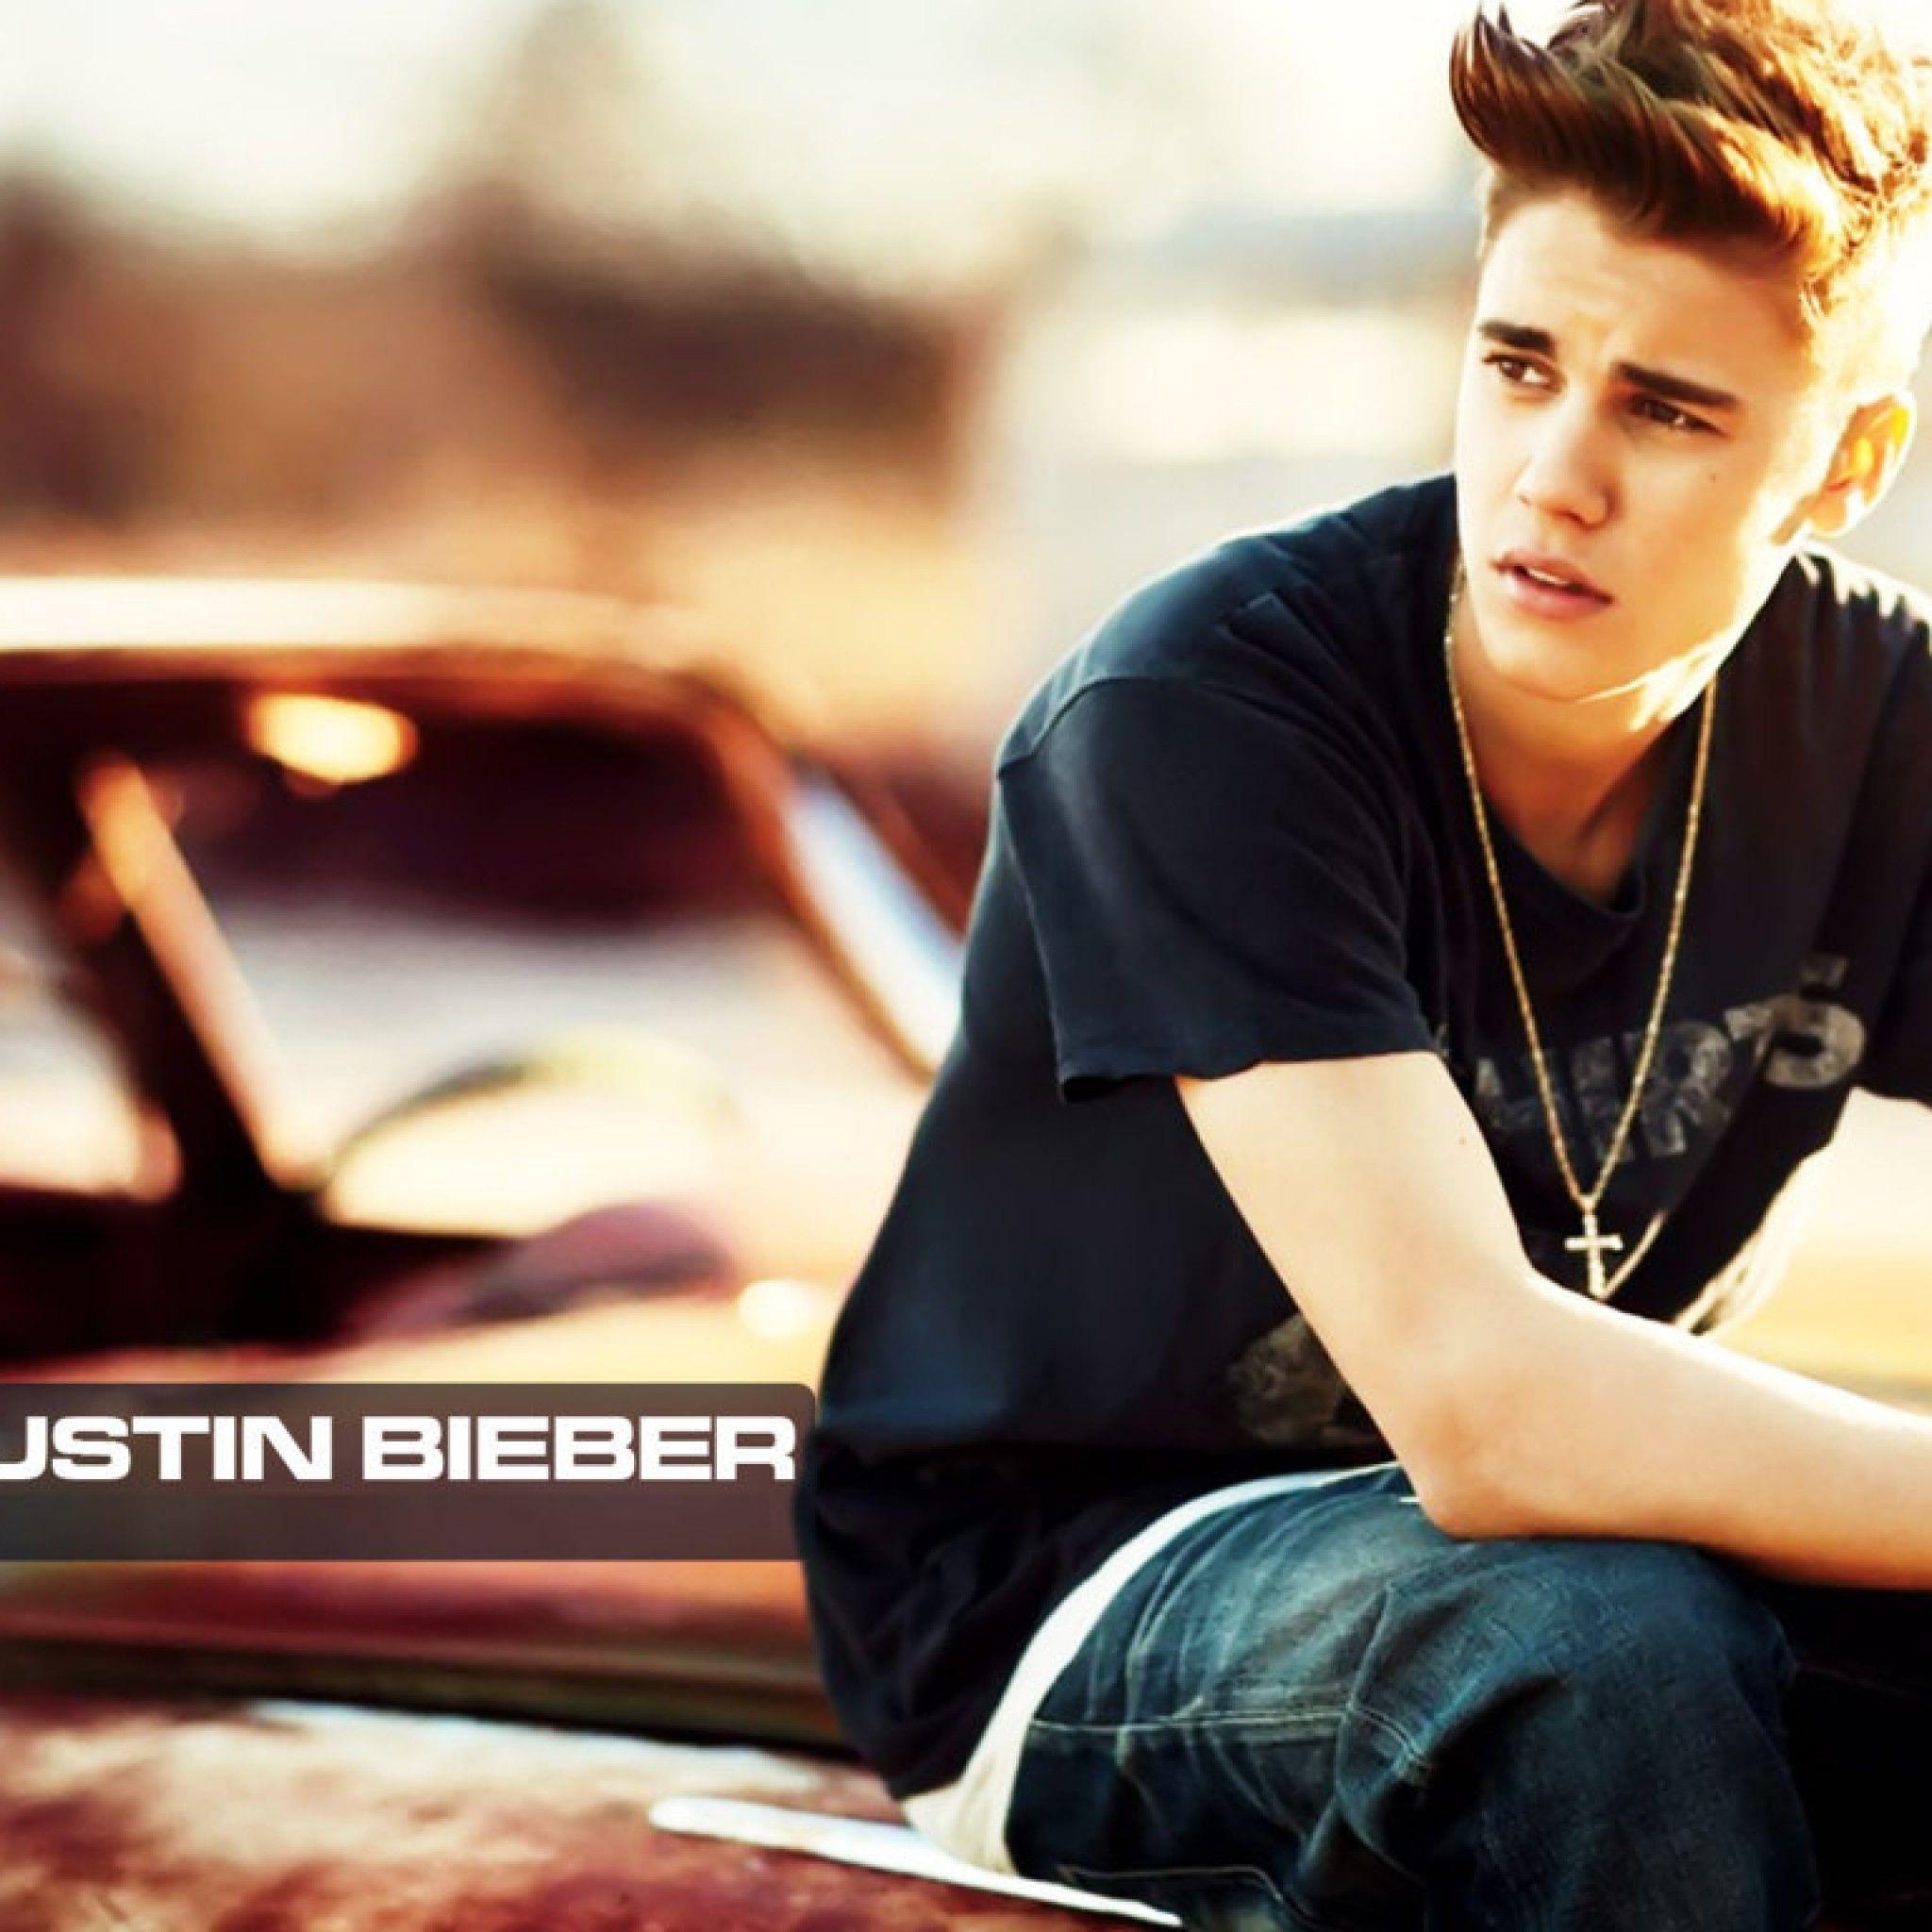 Justin Bieber 2015 Wallpaper